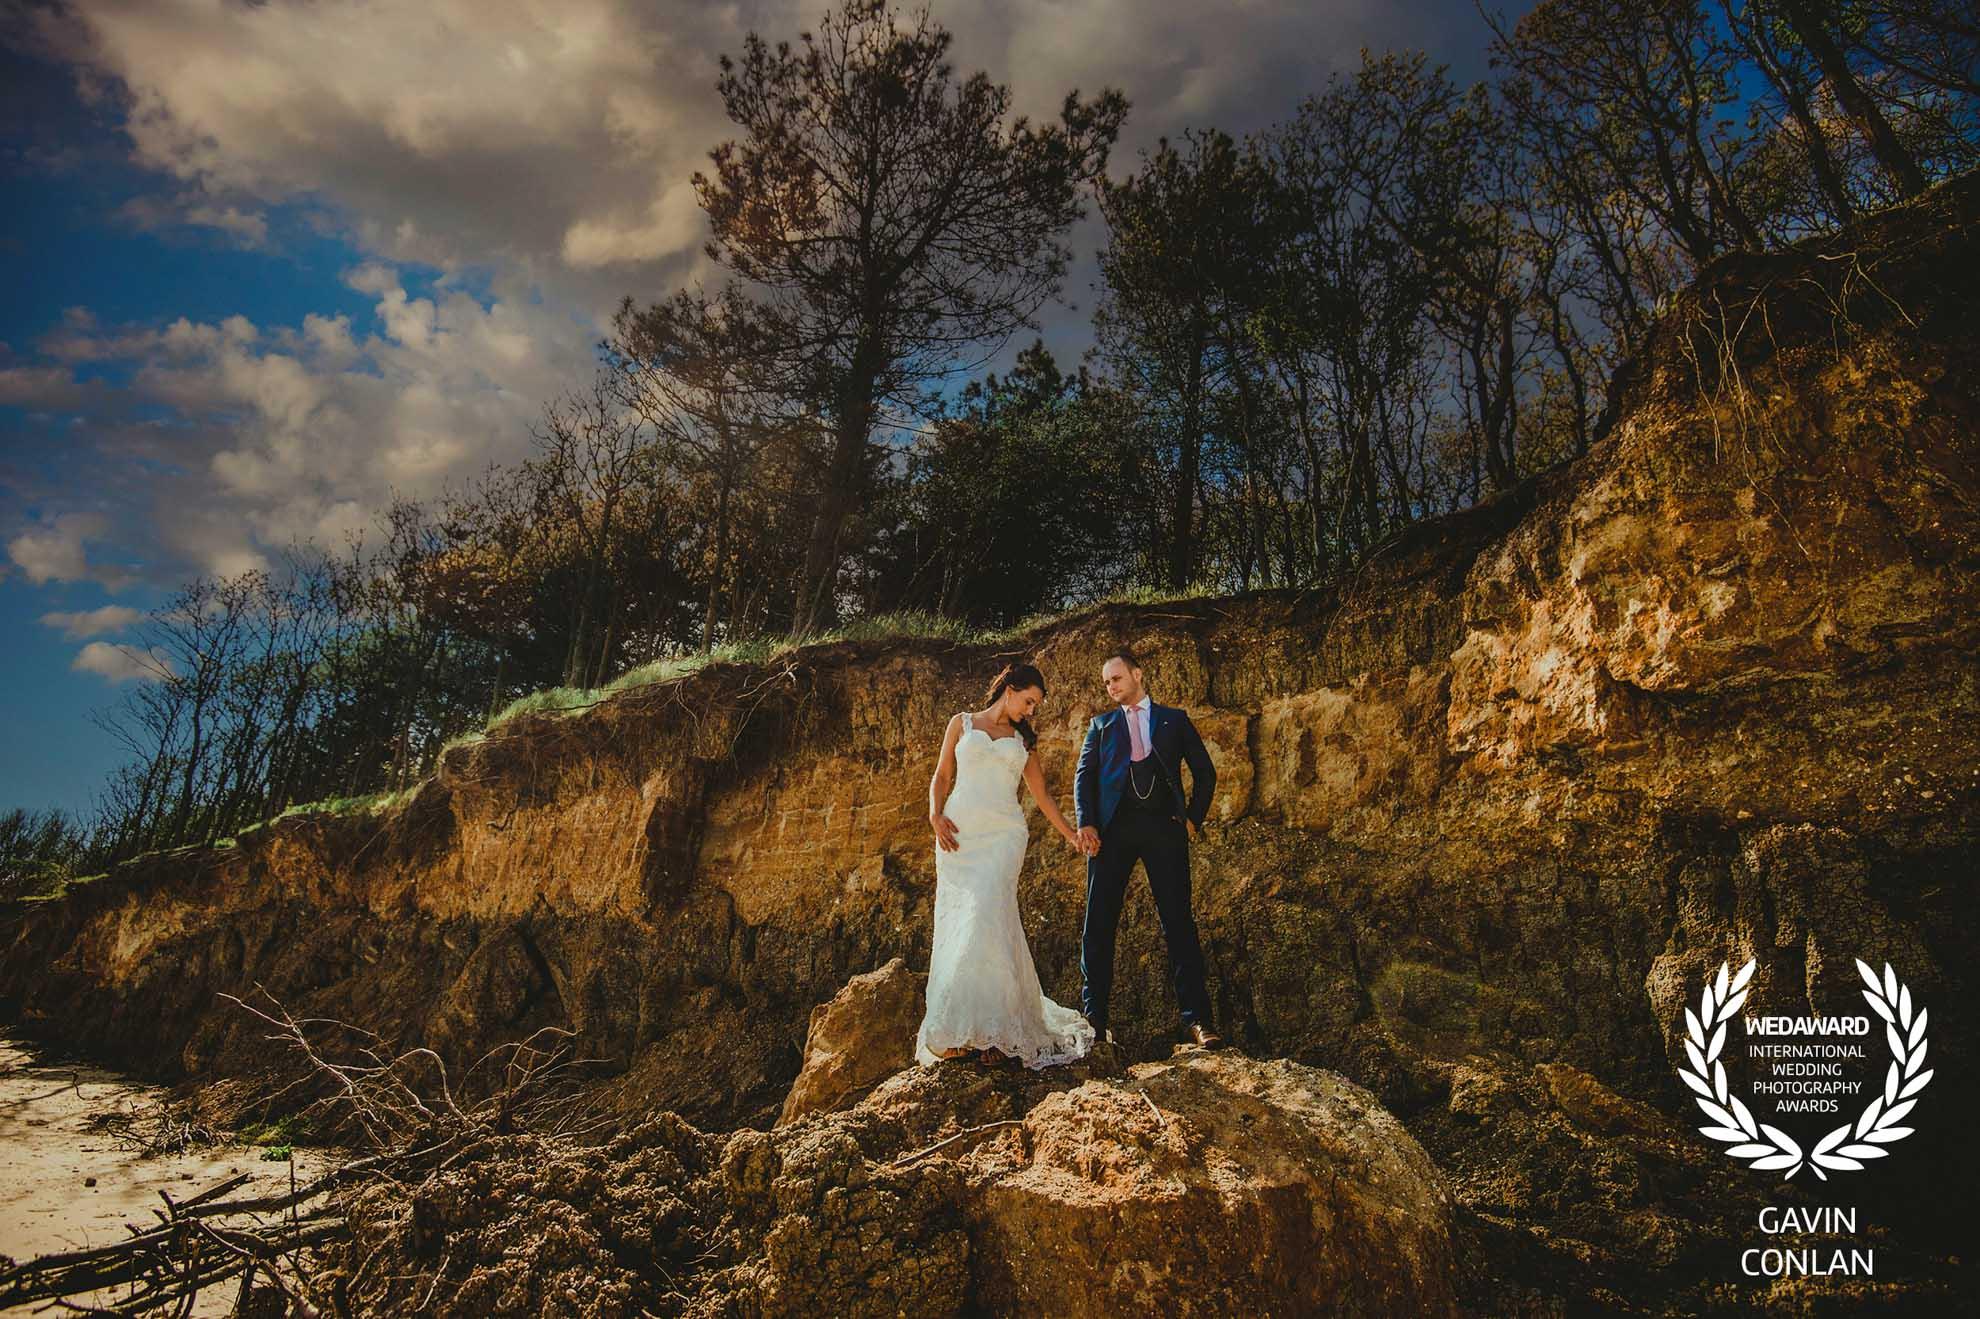 cudmore-grove-beach-wedding-gavin-conlan-photography